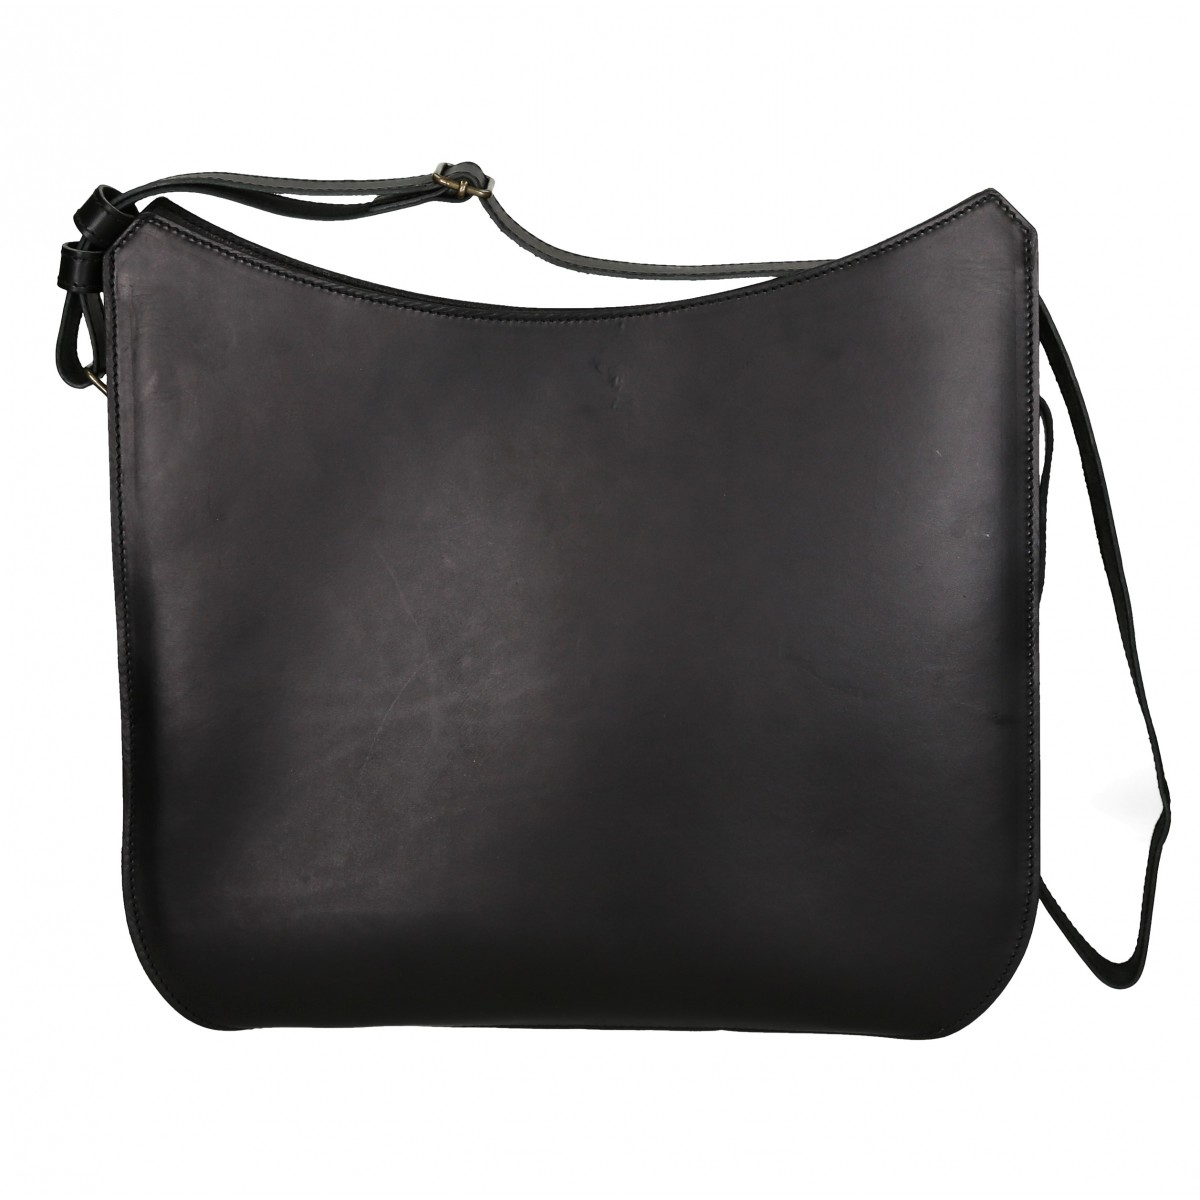 sac bandouli re en cuir noir fait main en italie. Black Bedroom Furniture Sets. Home Design Ideas